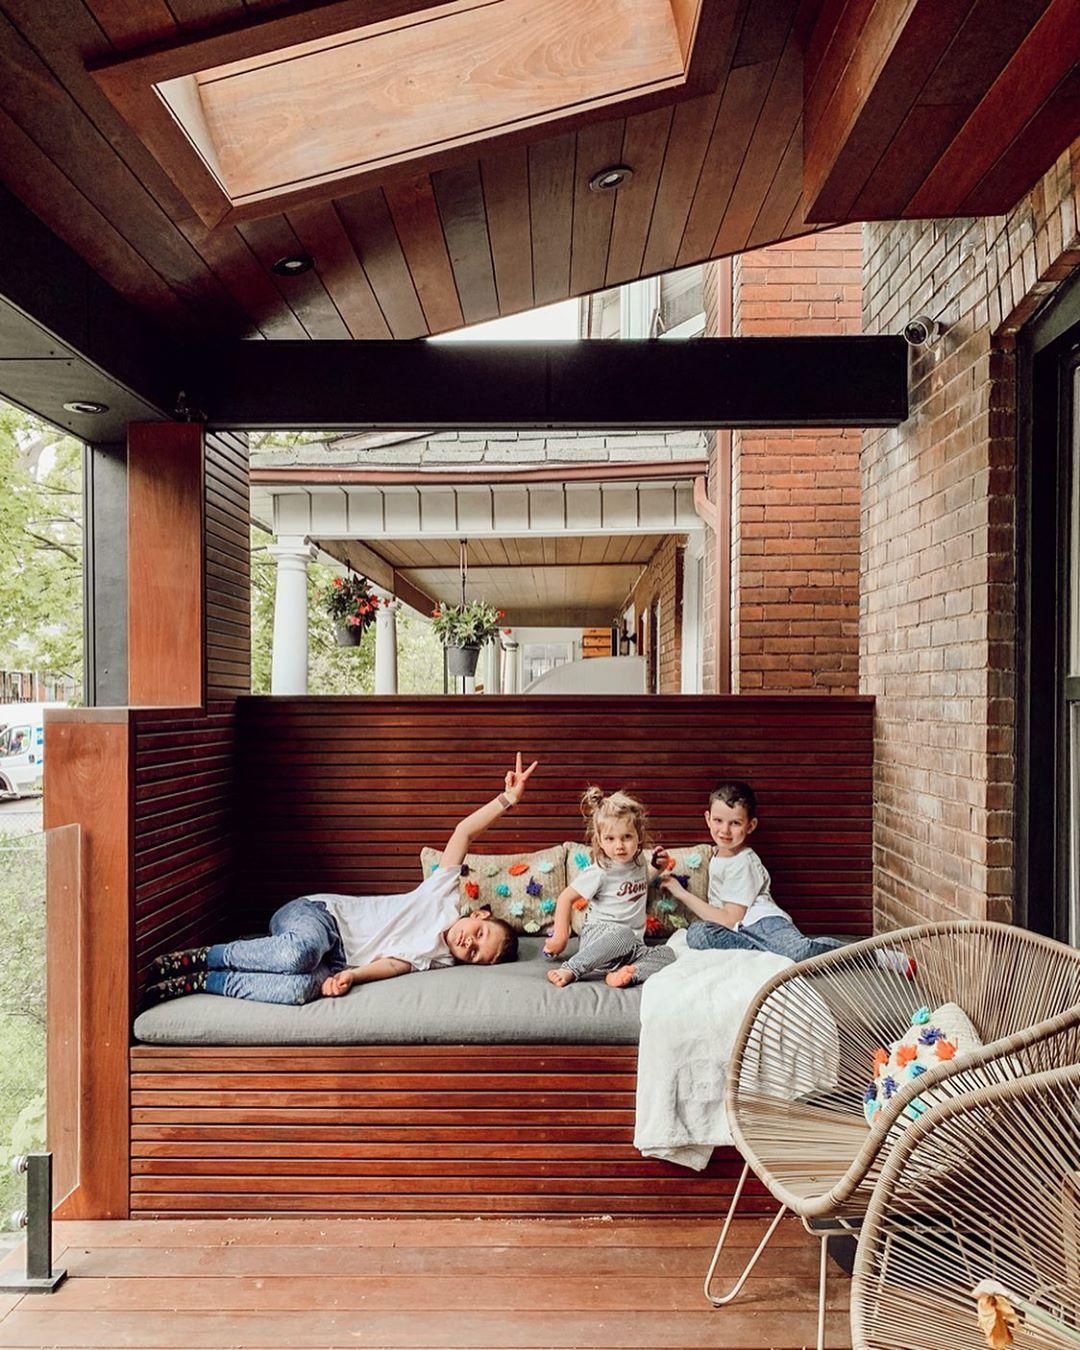 Follow Bluebirdkisses On Instagram For More Porch Decor